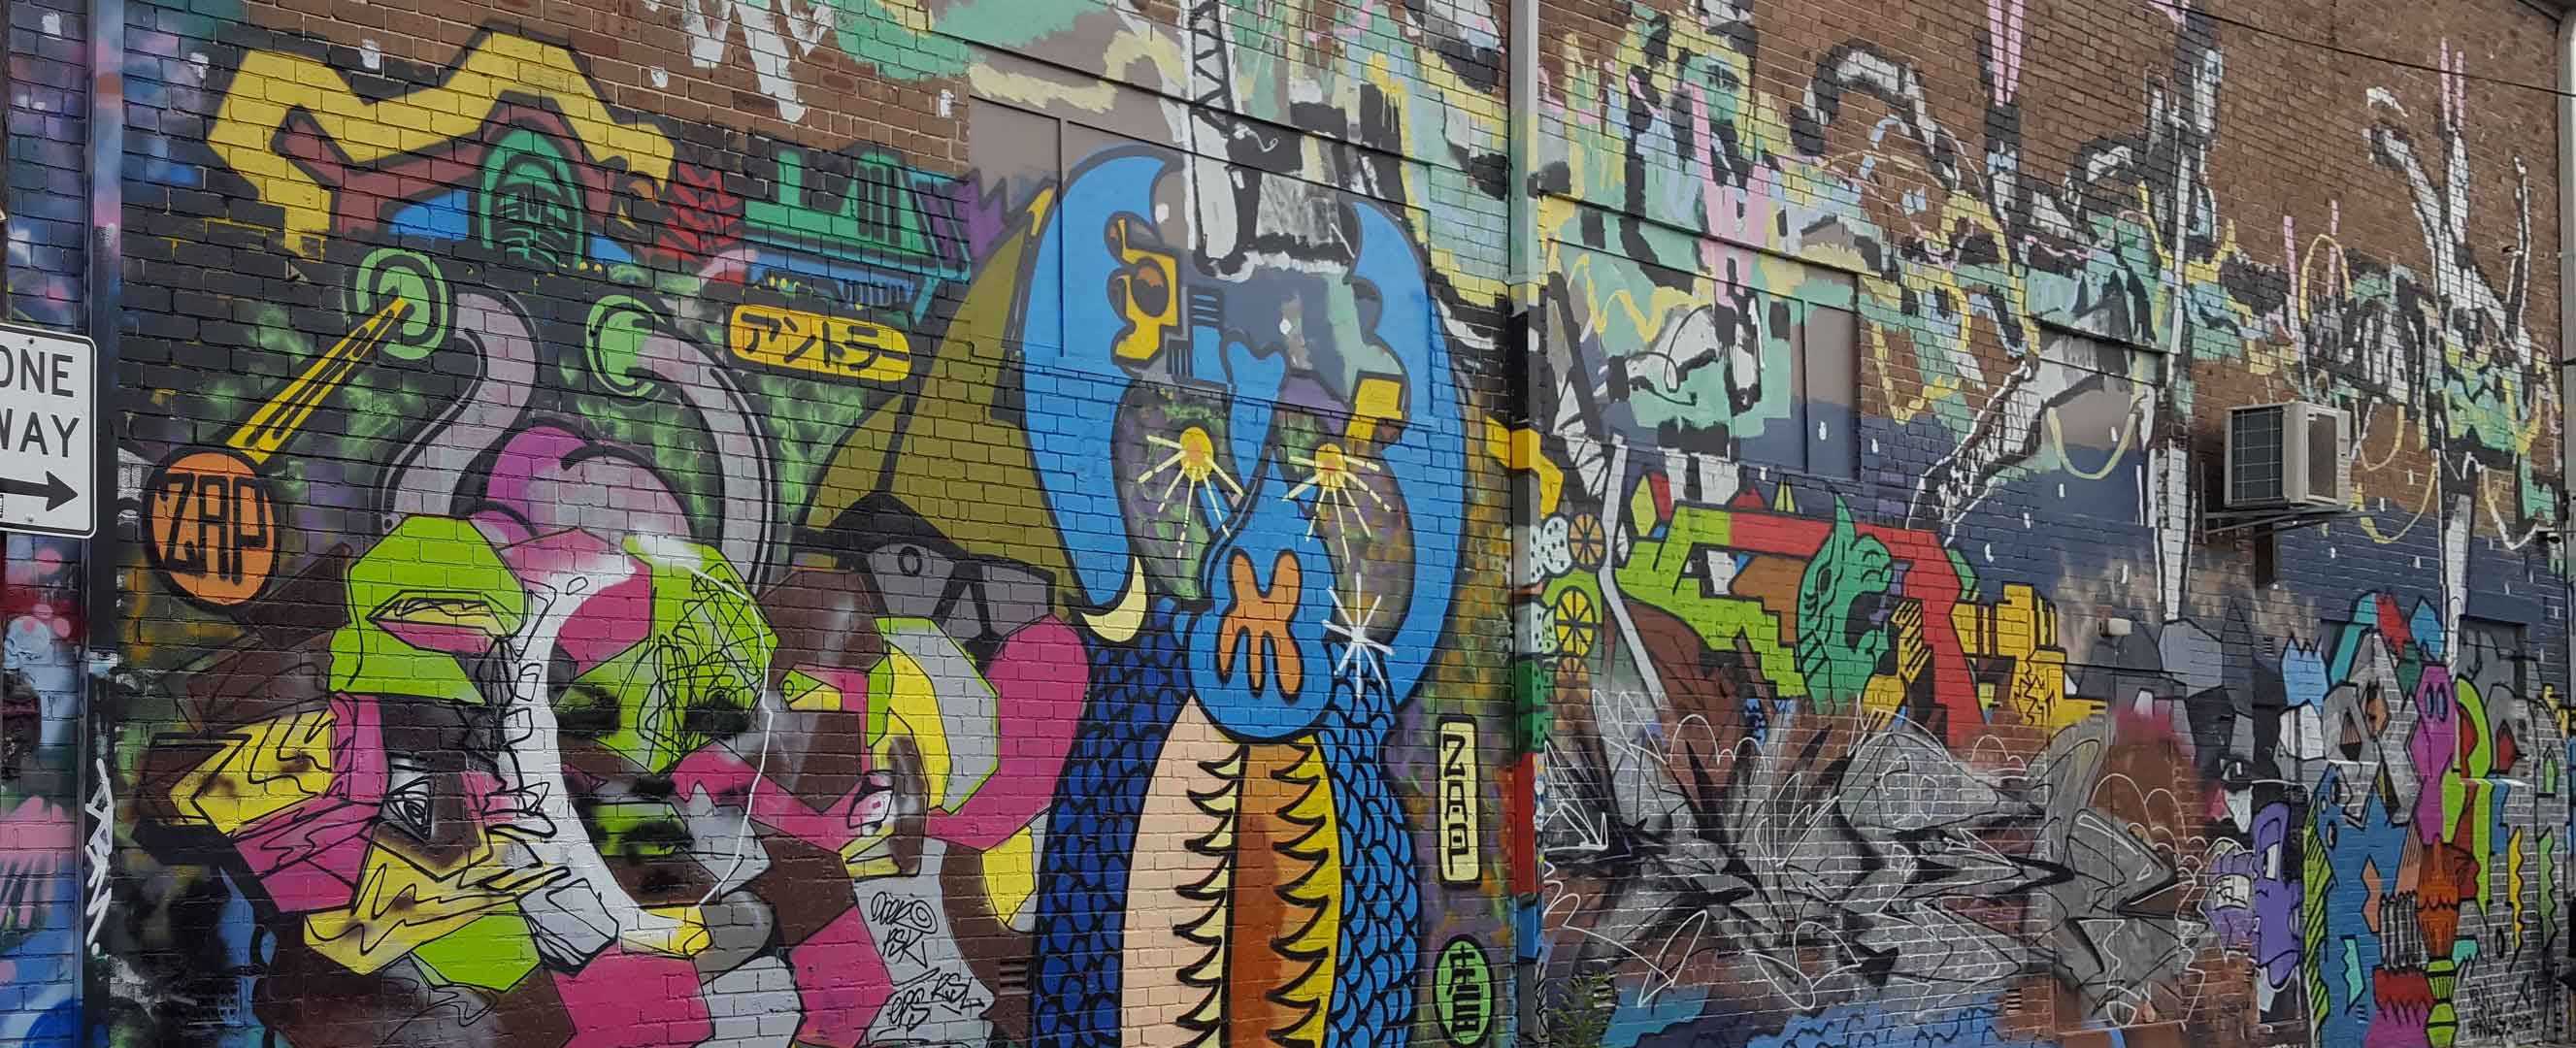 denison-street-graffiti2